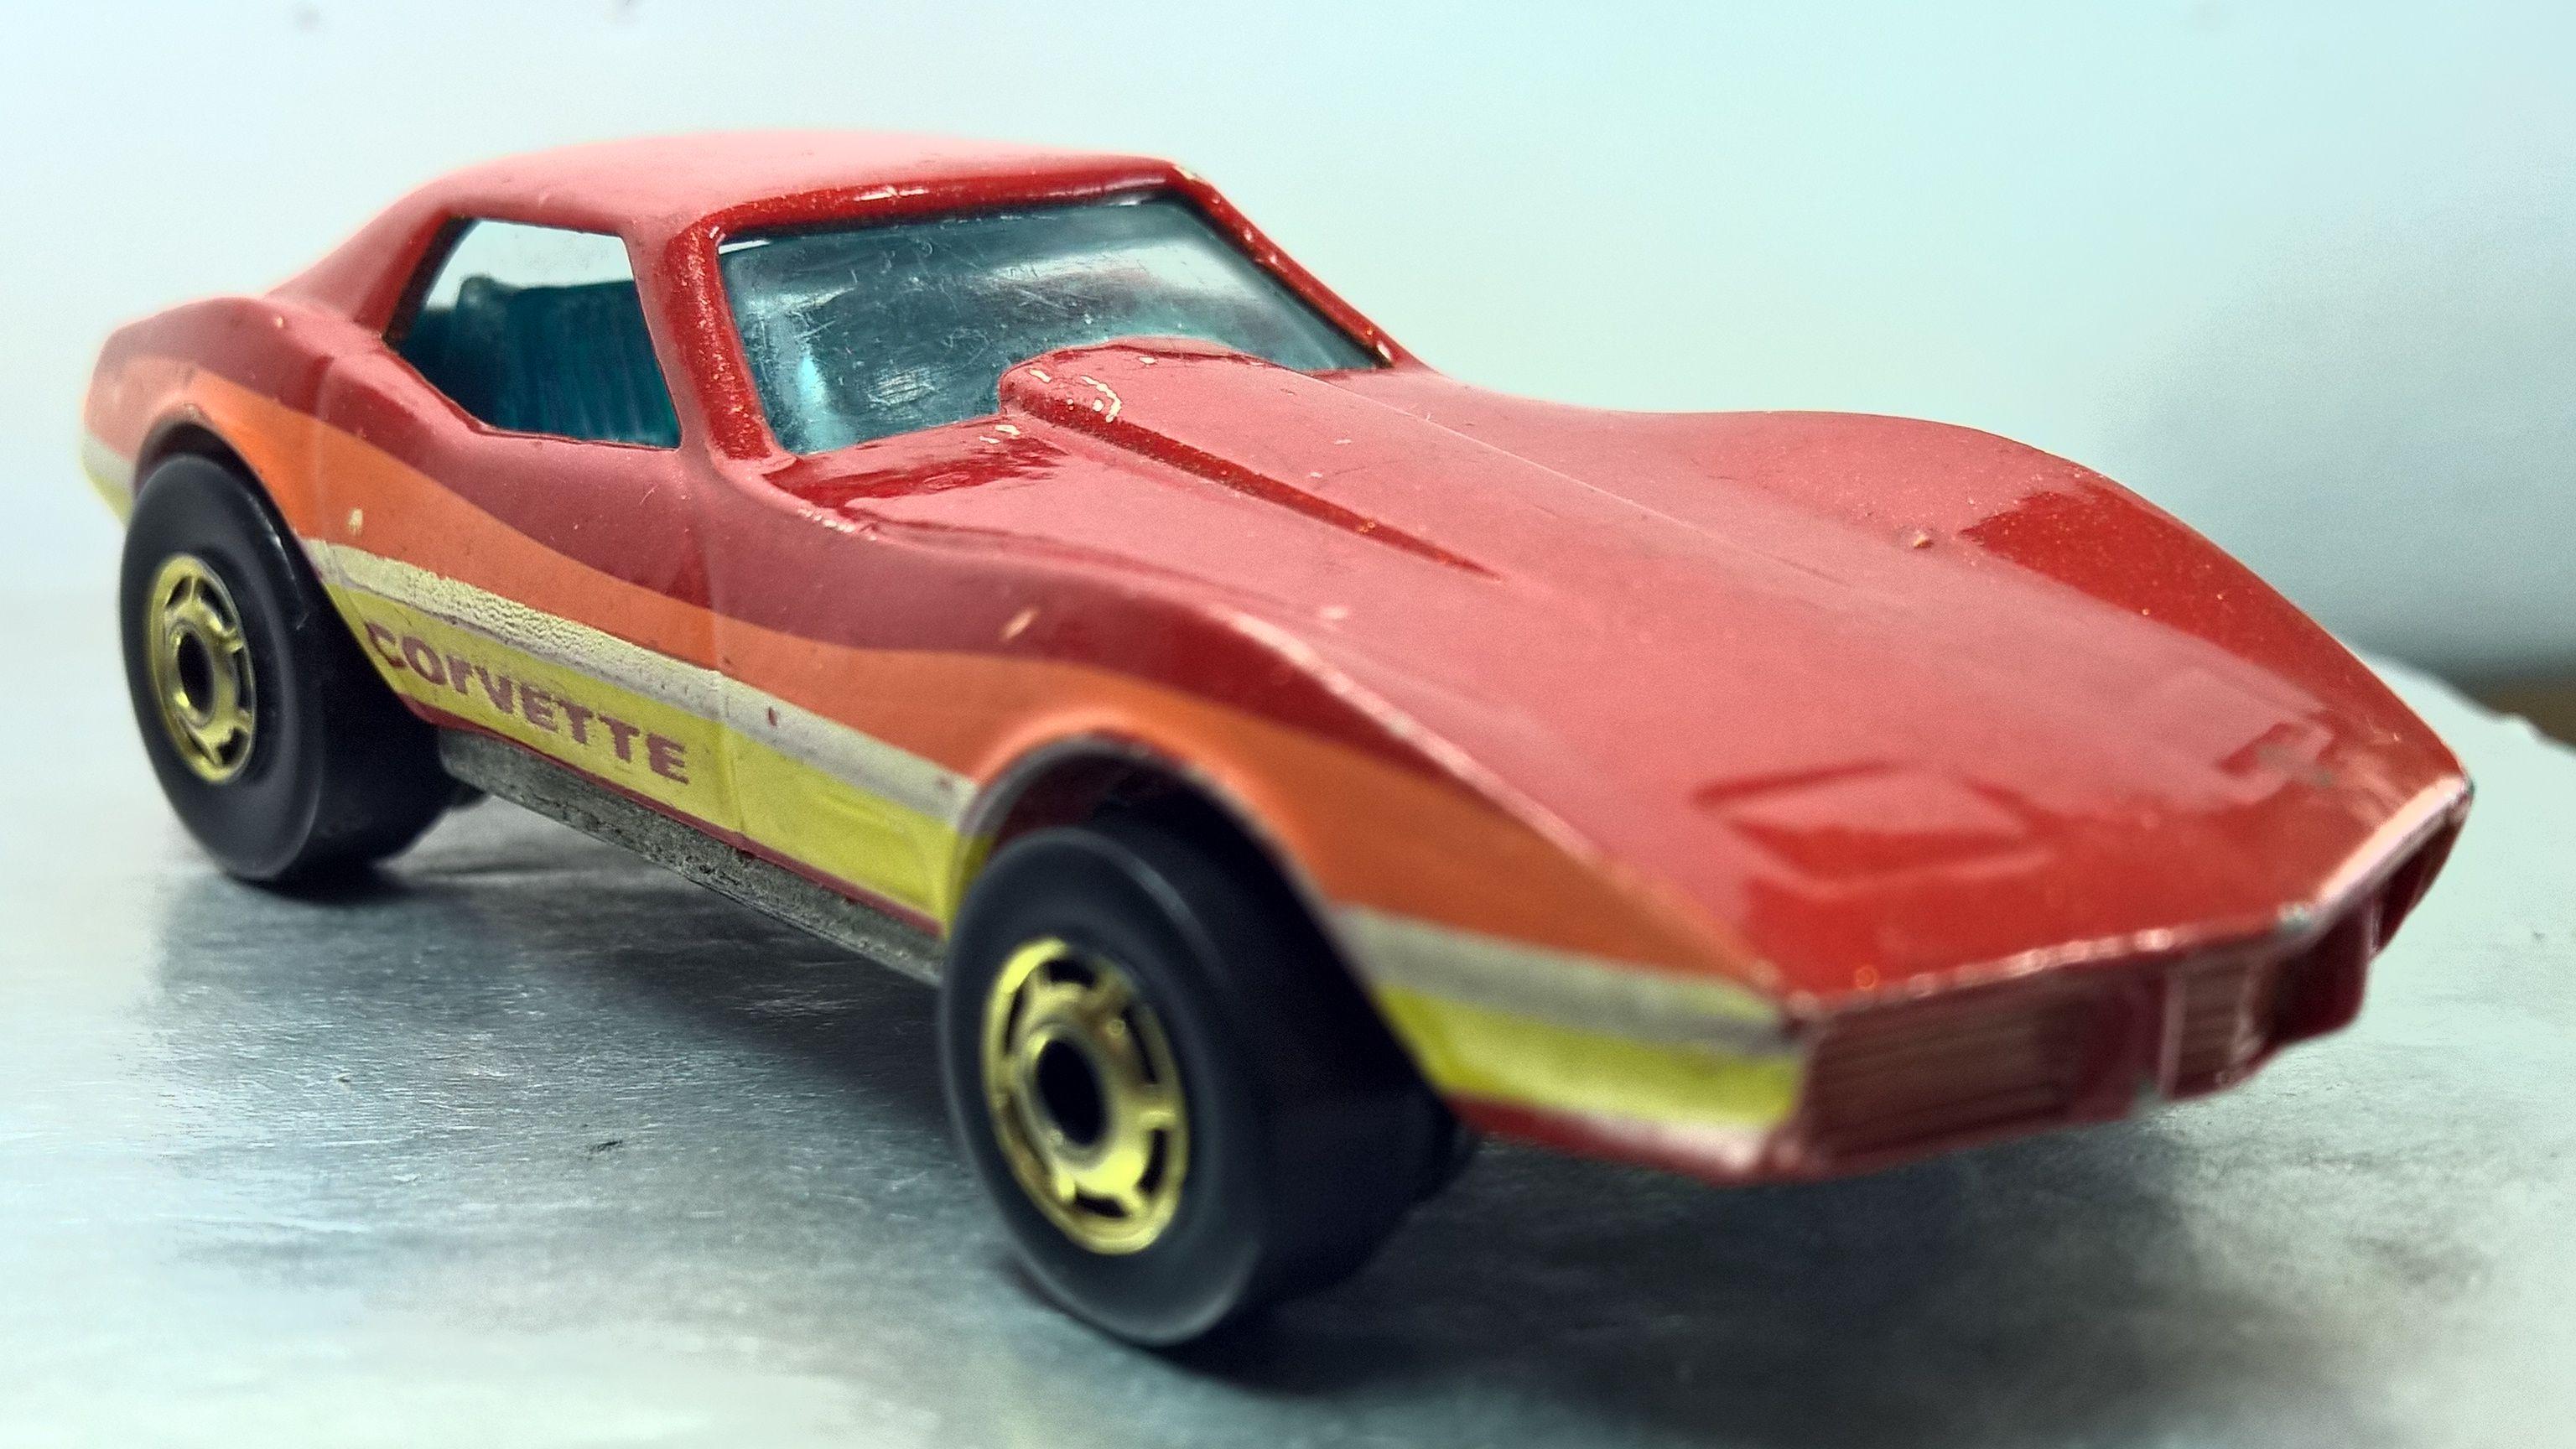 Hot Wheels Corvette Stingray The Hot Ones 1982 Toy Model Cars Hot Wheels Hot Weels